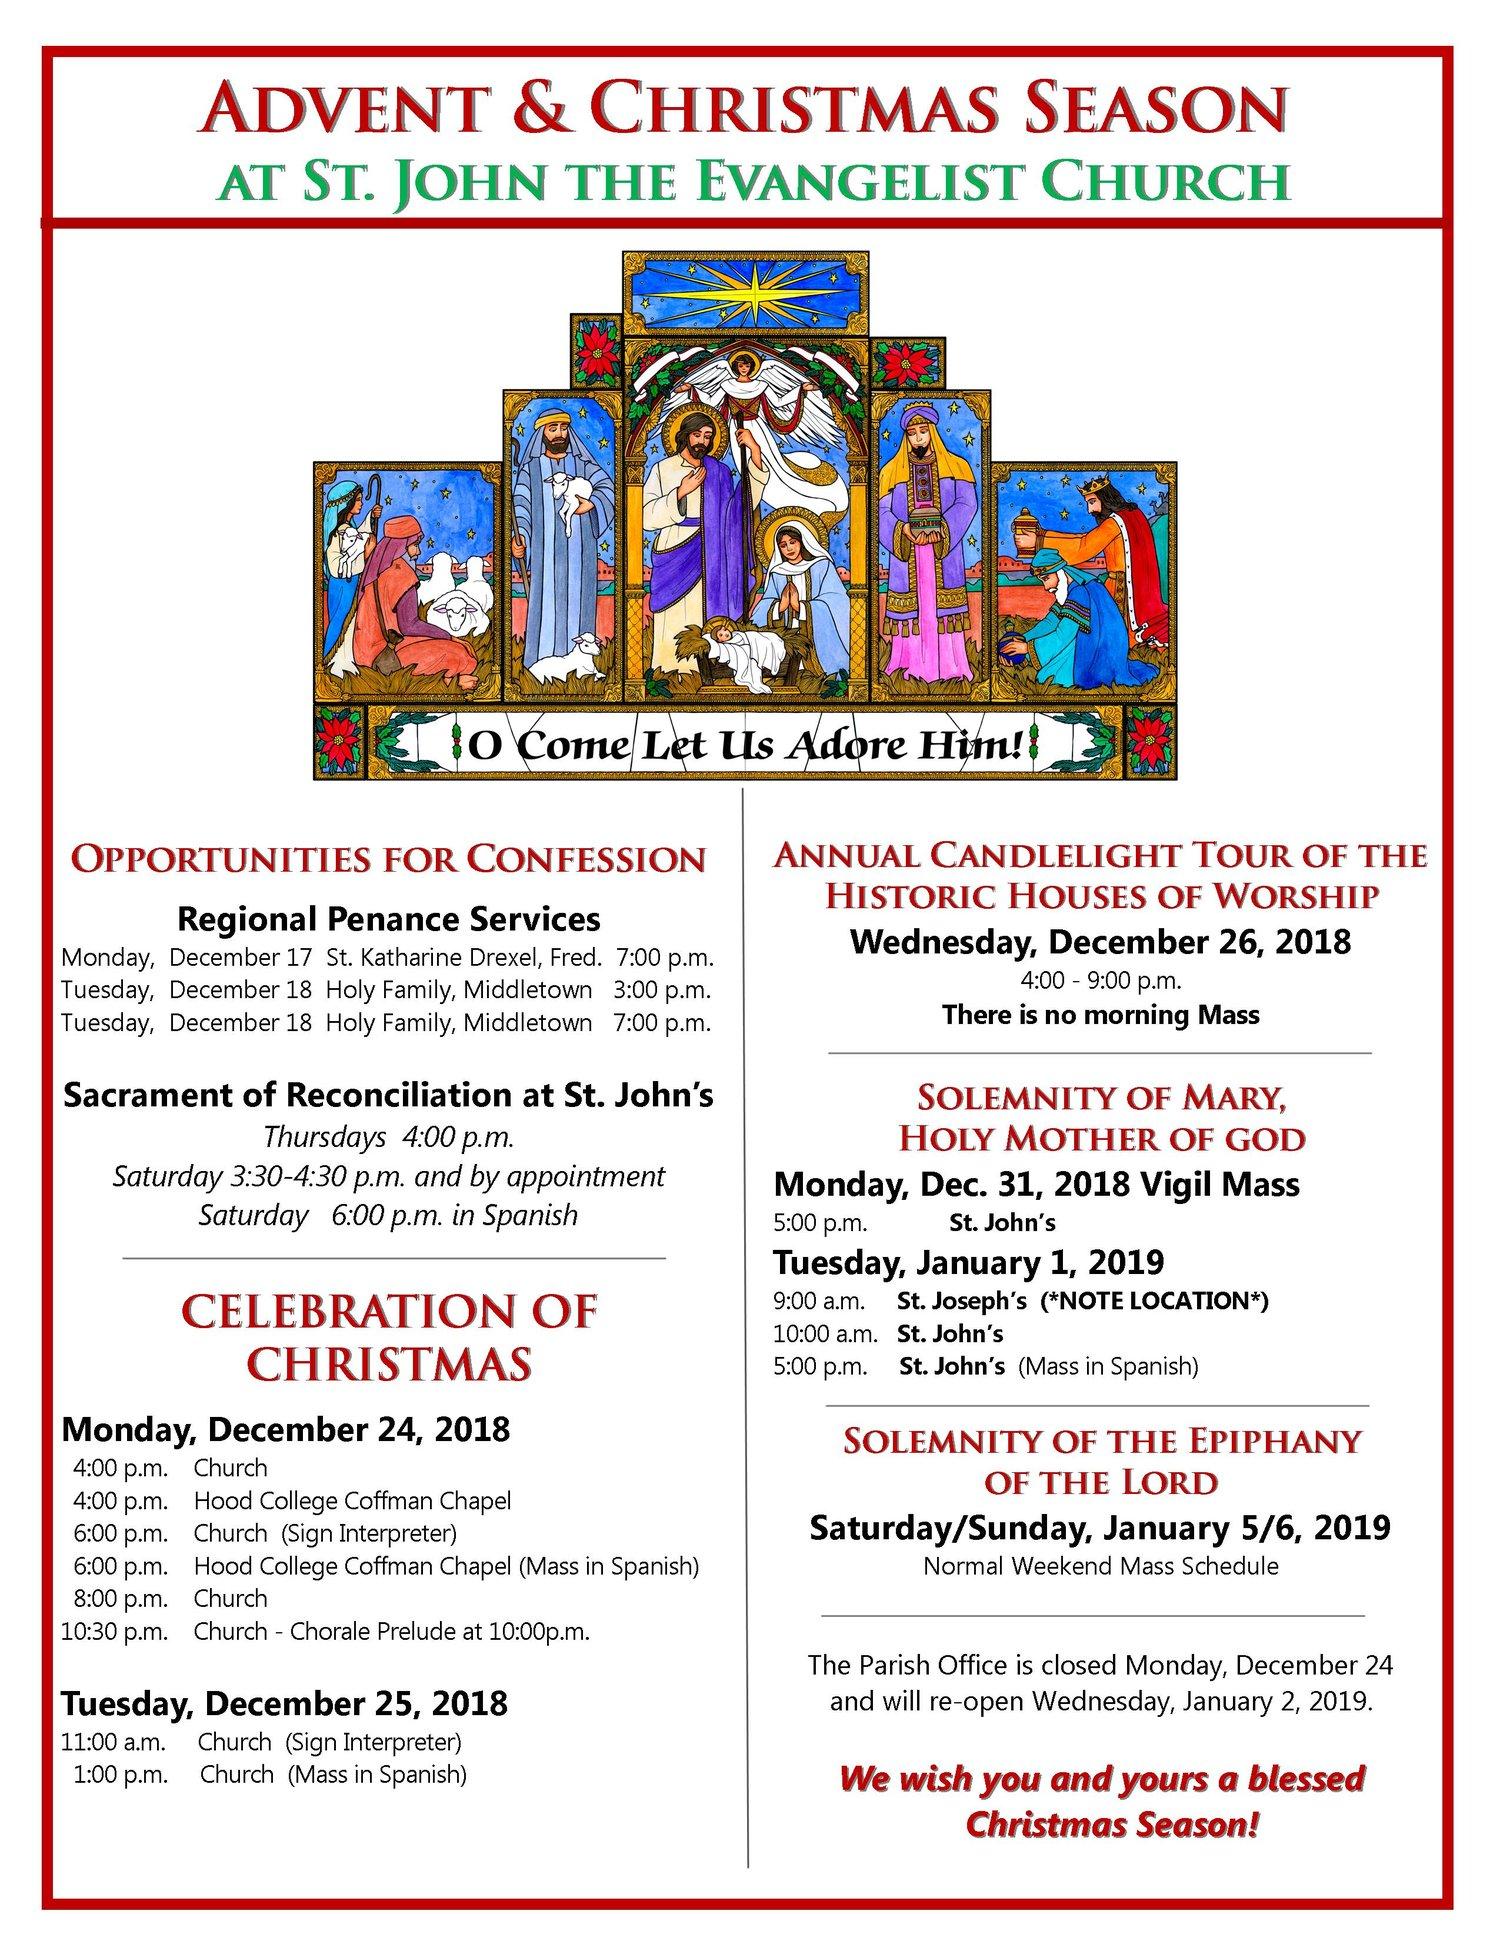 Christmas Season Schedule St John The Evangelist